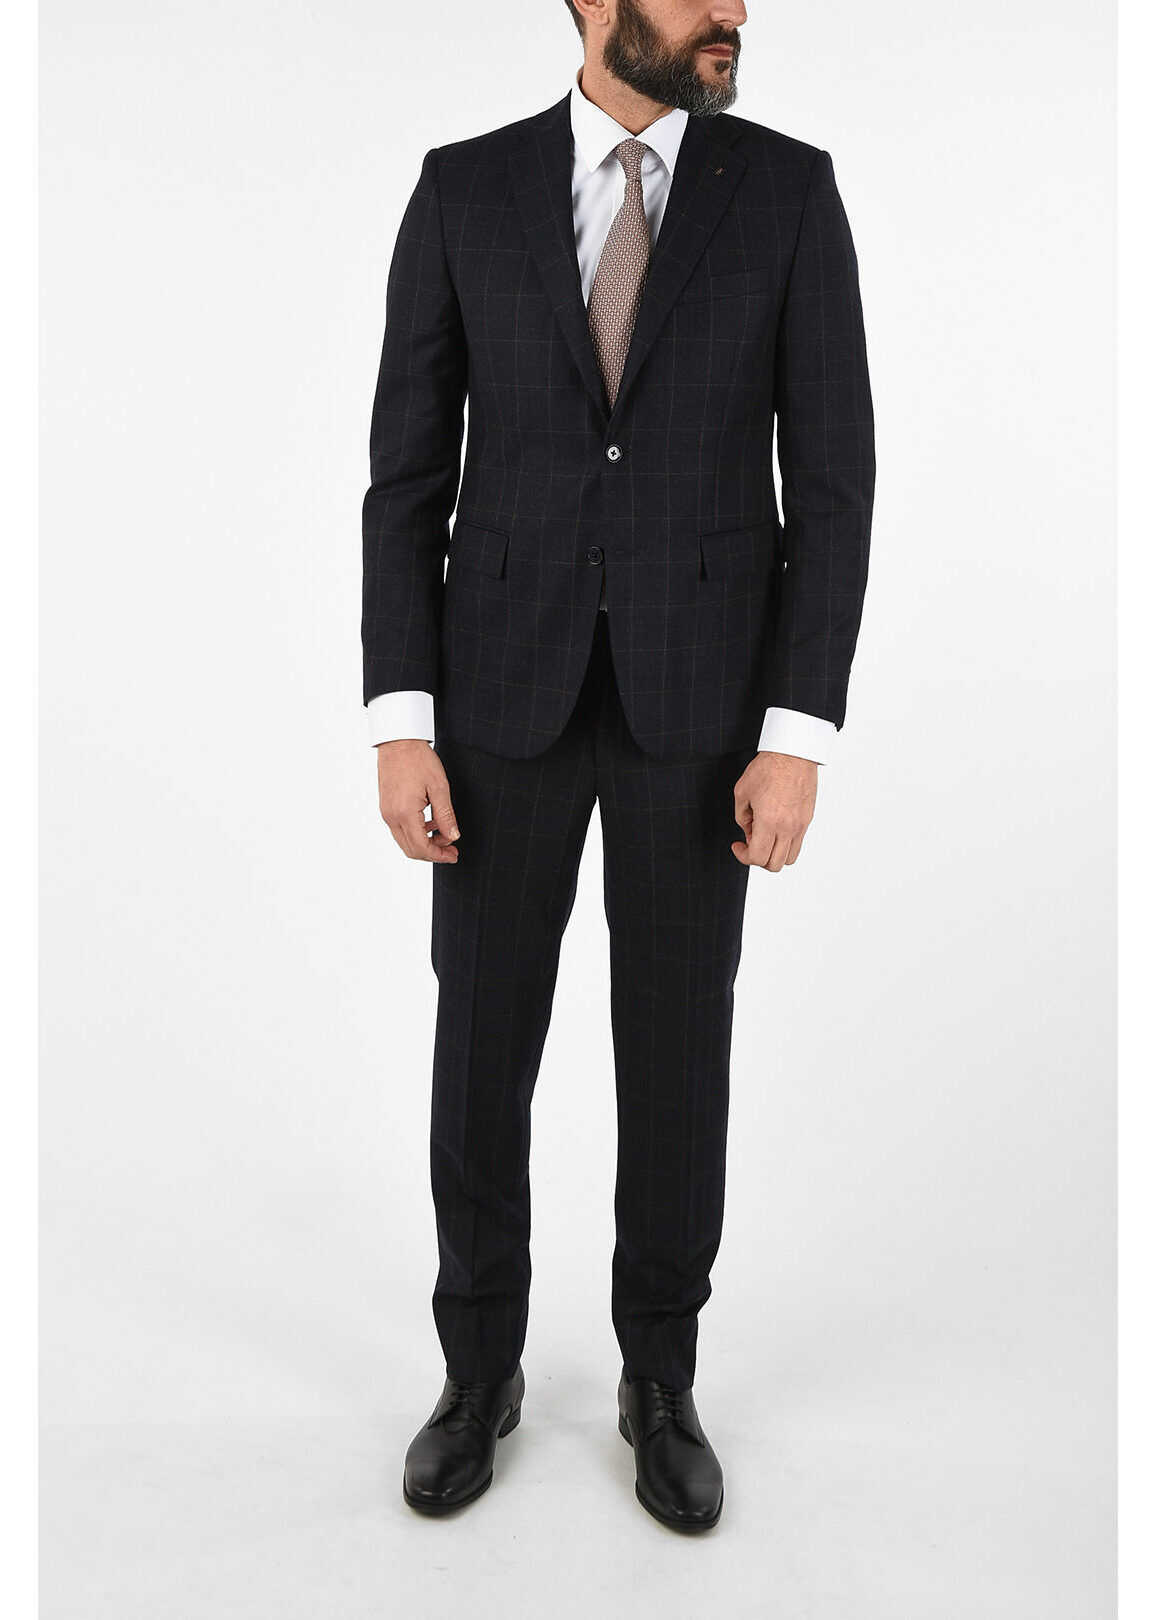 CORNELIANI CC COLLECTION REFINED check virgin wool drop 7R suit BLUE imagine